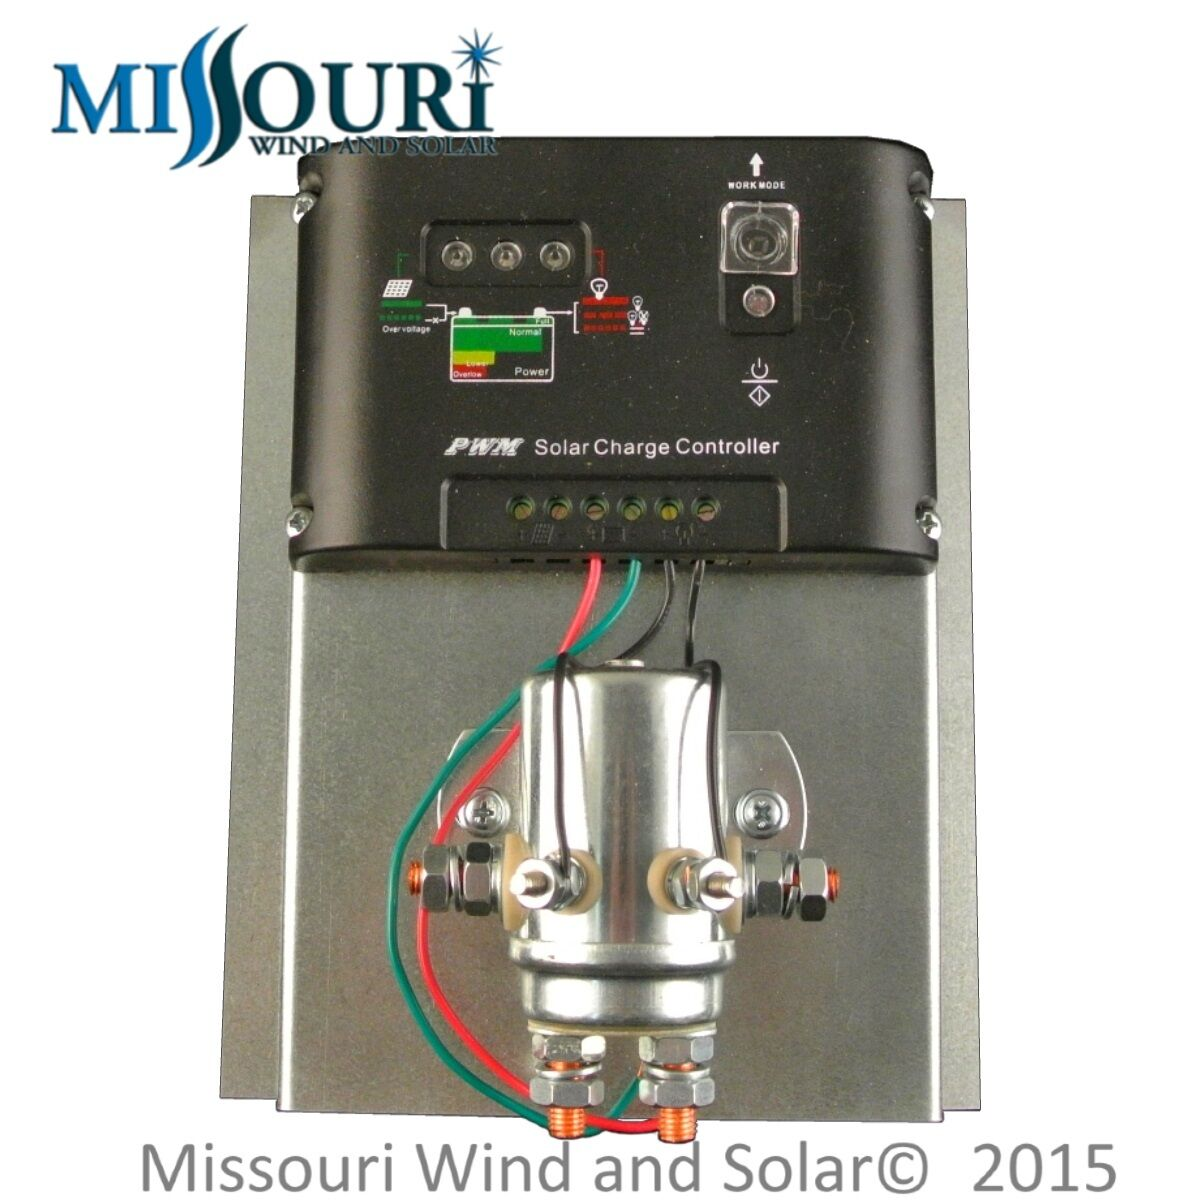 watt wind turbine 12 volt 400 amp 10 000 watt charge controller for wind turbine solar panel pv